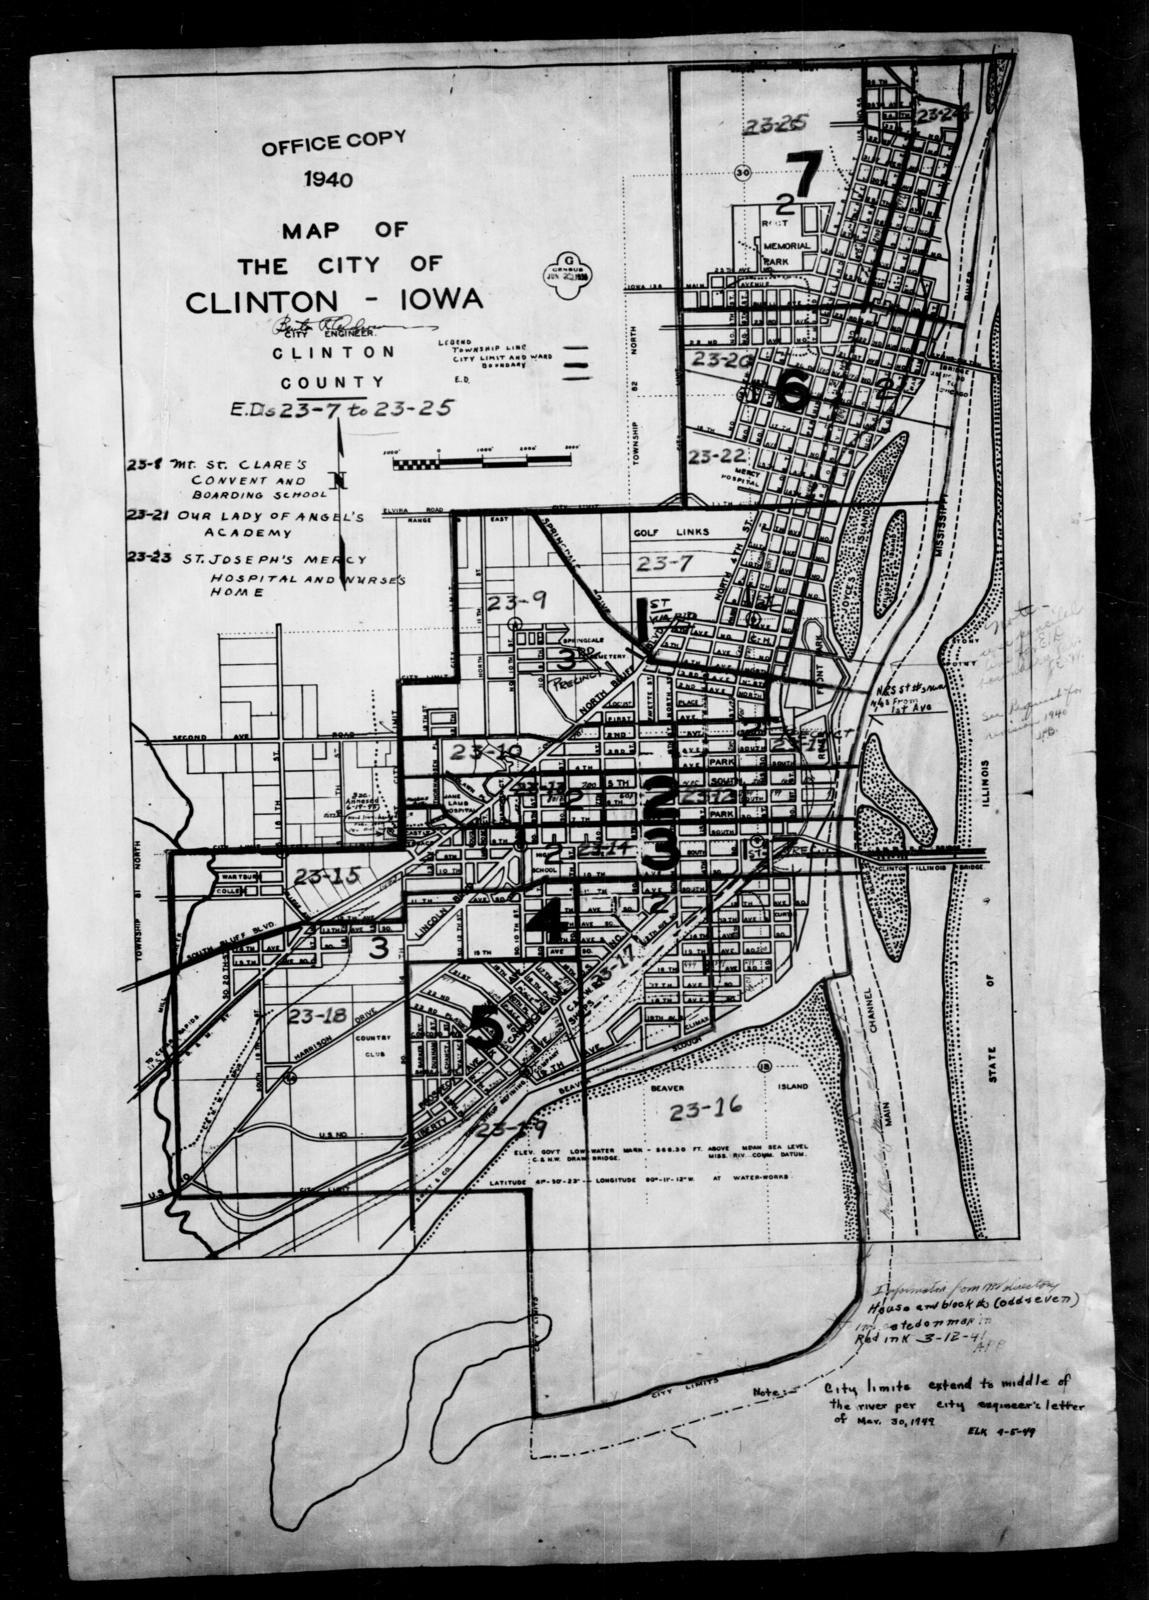 1940 Census Enumeration District Maps Iowa Clinton County